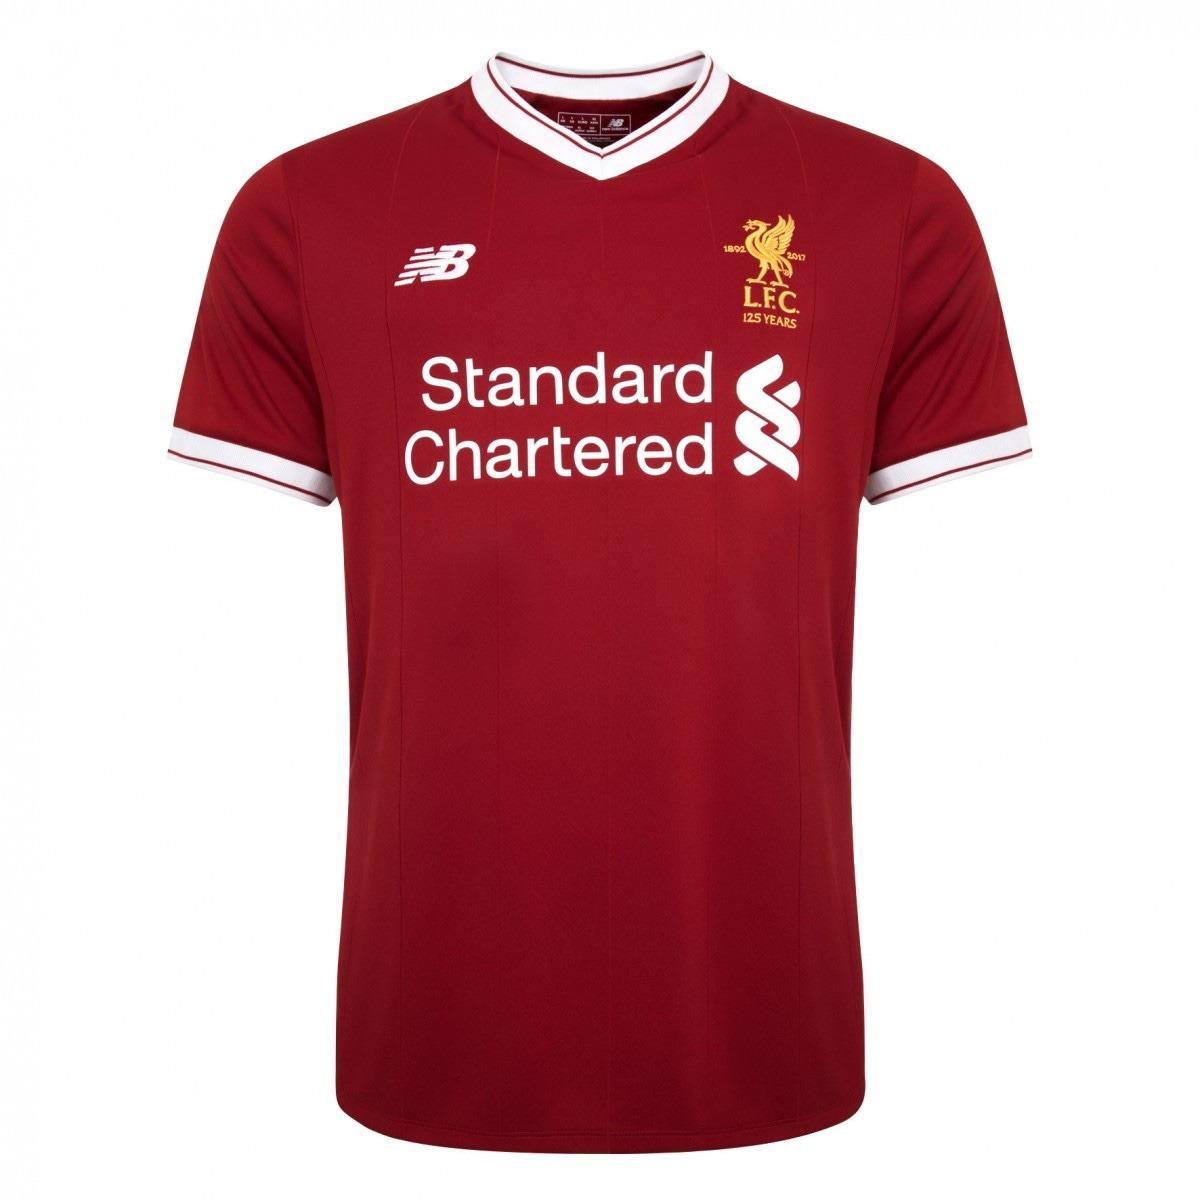 camiseta oficial liverpool local 2017 18 new balance +bono. Cargando zoom. 41cf94cfeb2